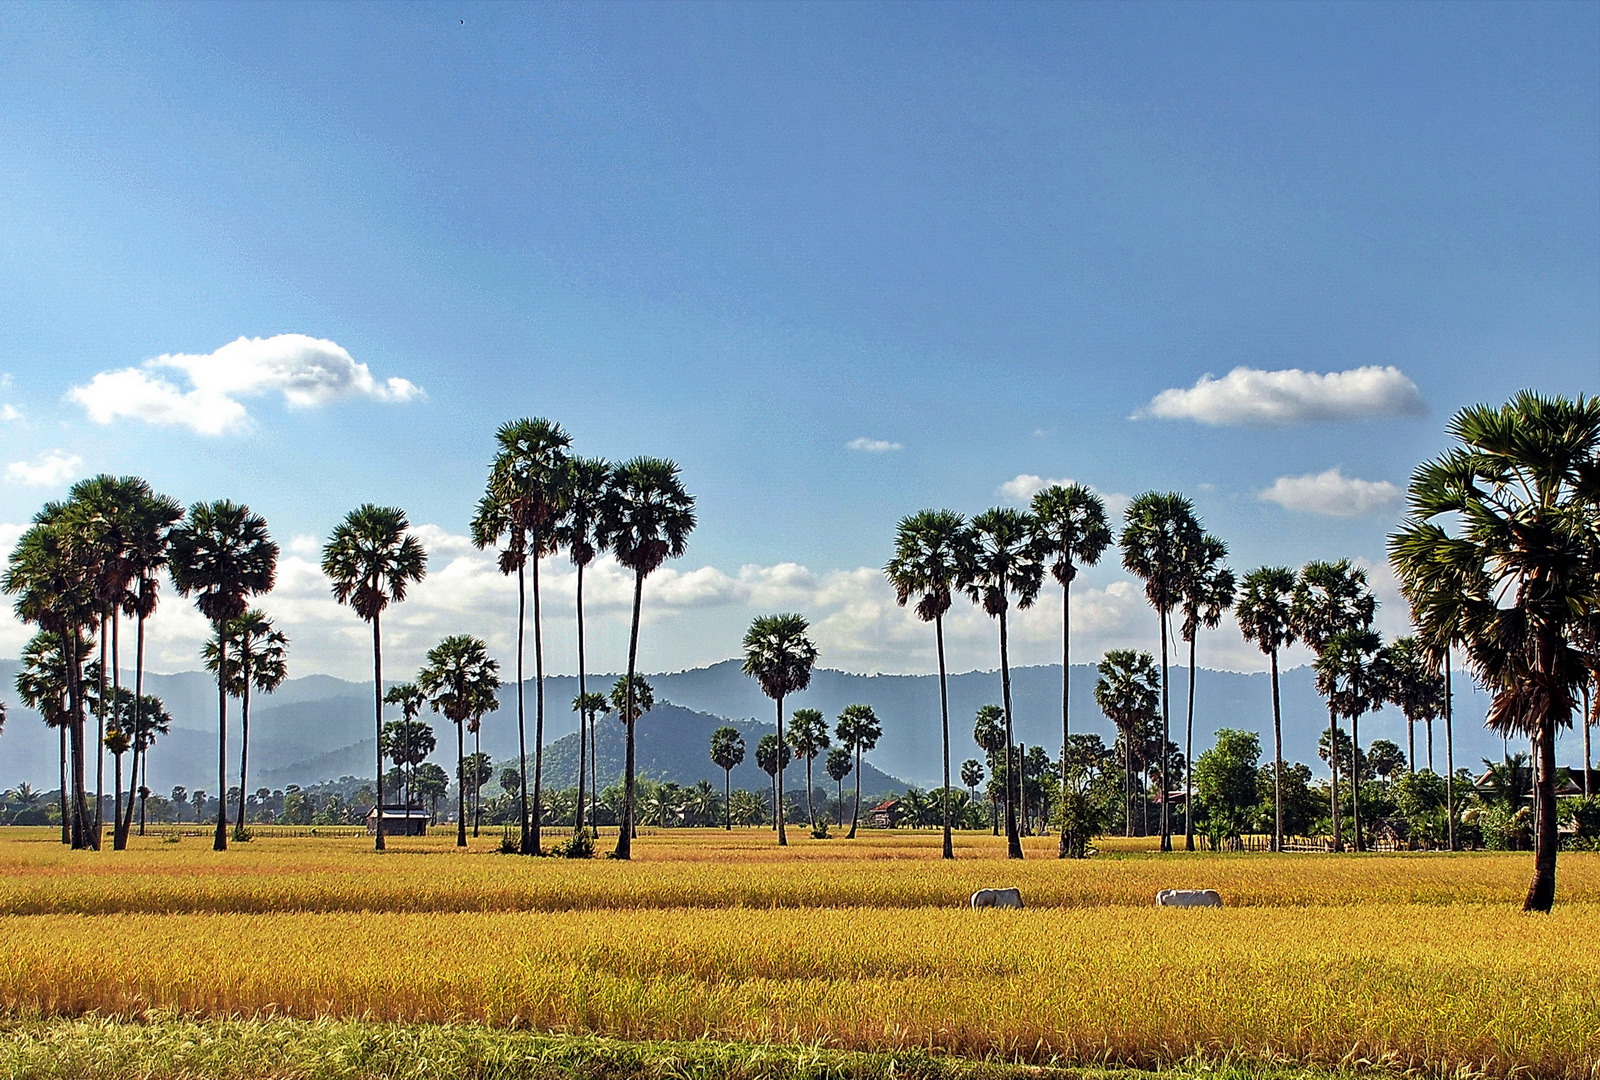 Cambodia, typical landscape